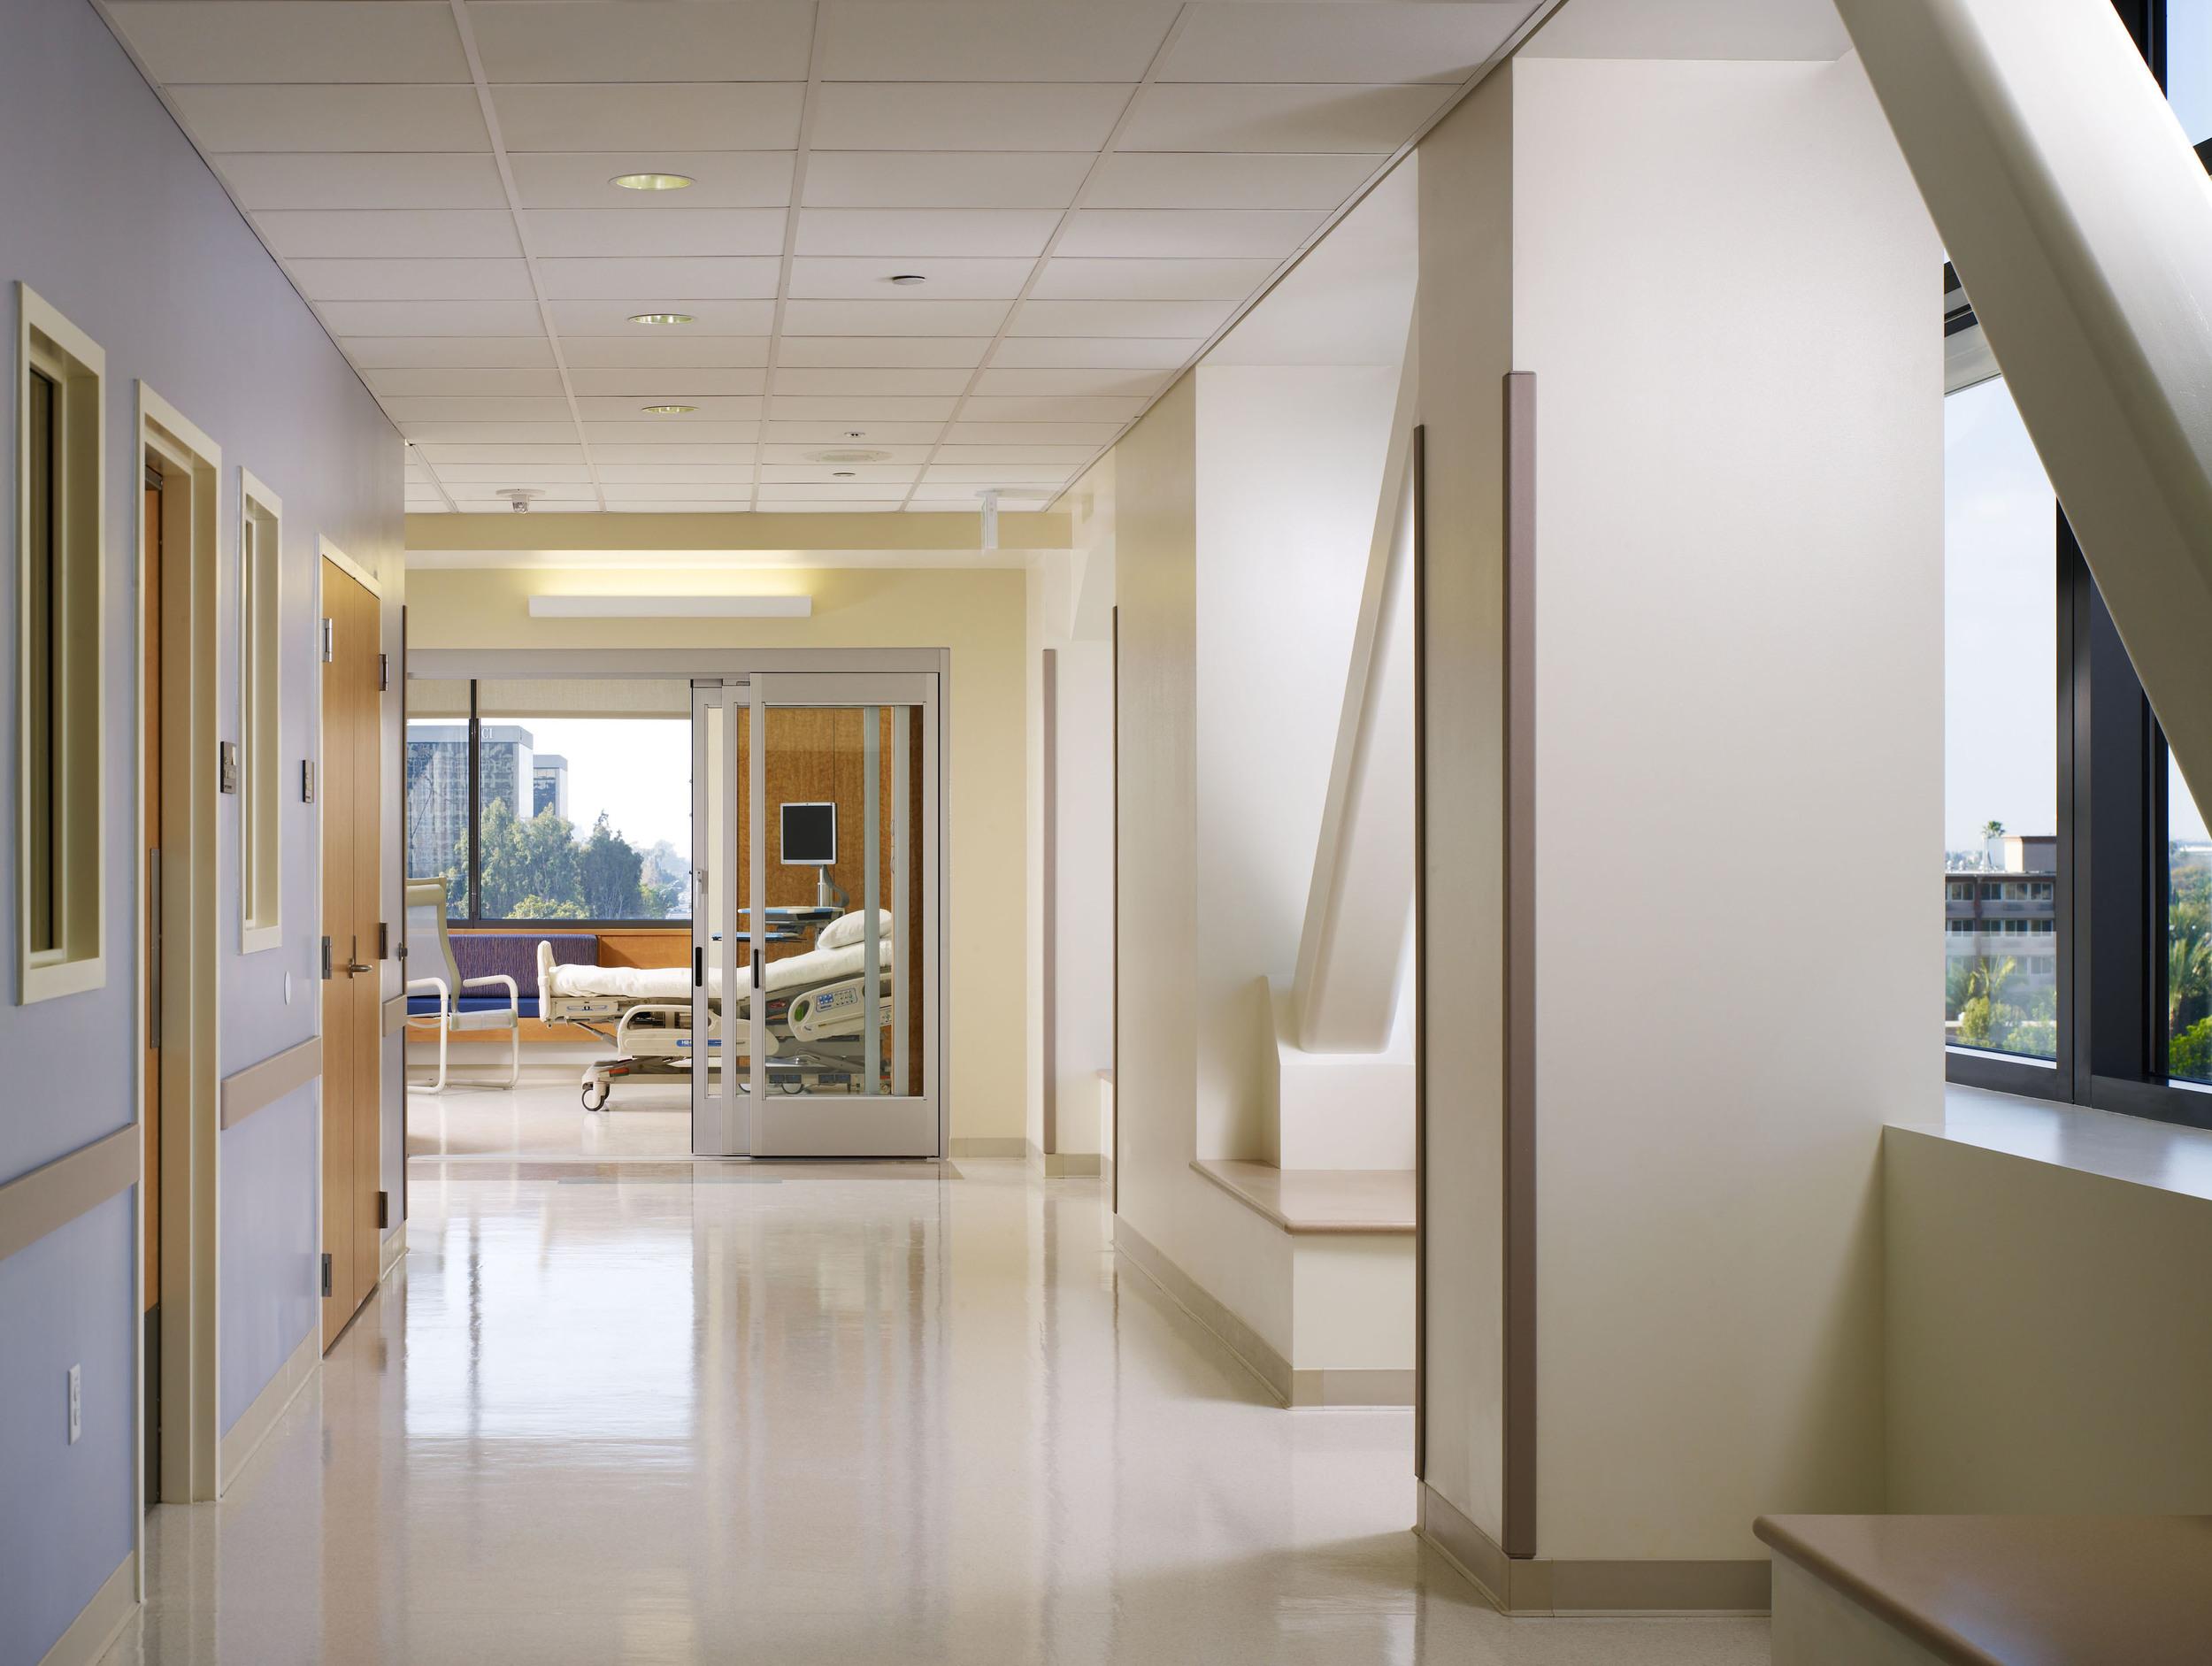 UCIrvine Douglas Hospital Interior - Patient Care 01.jpg